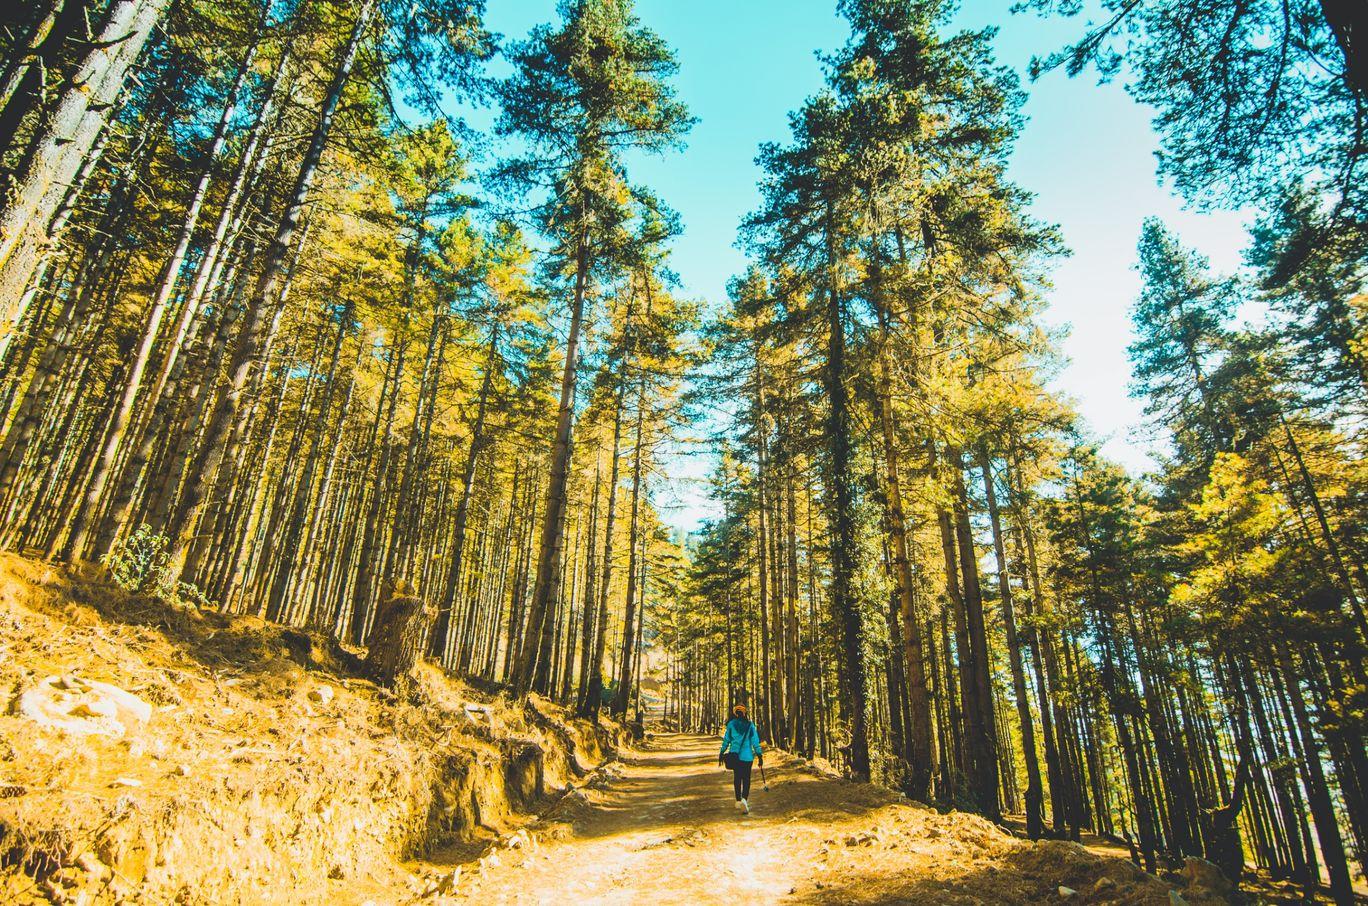 Photo of Bhutan By Sandeep Mendel